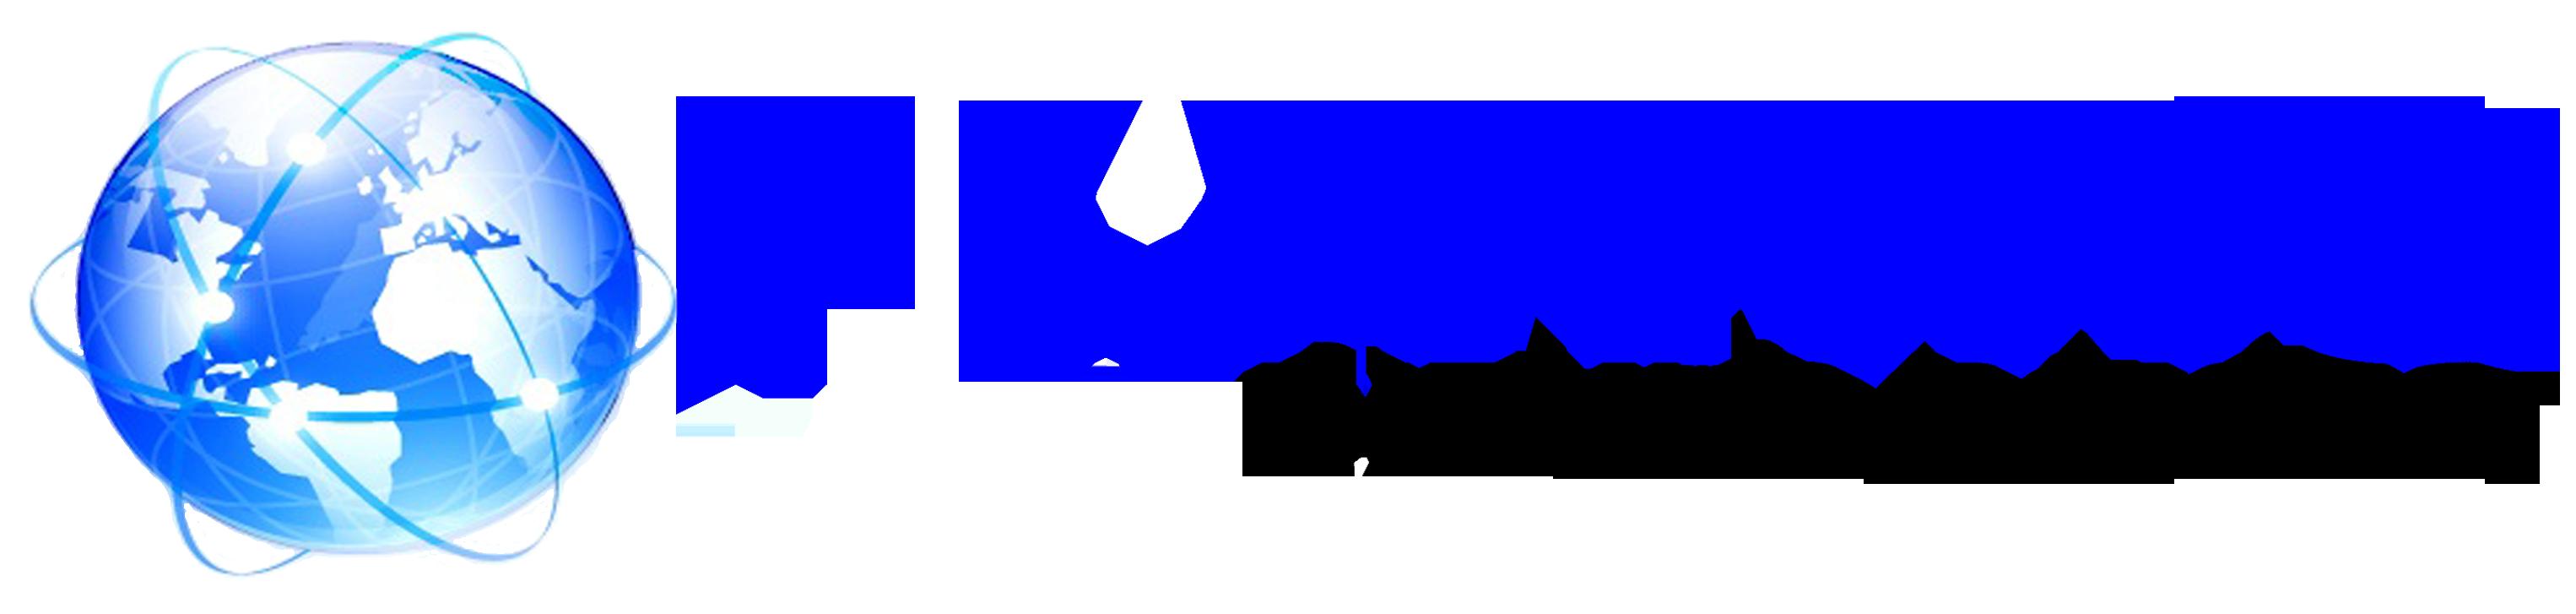 logo_platino_mundo.PNG